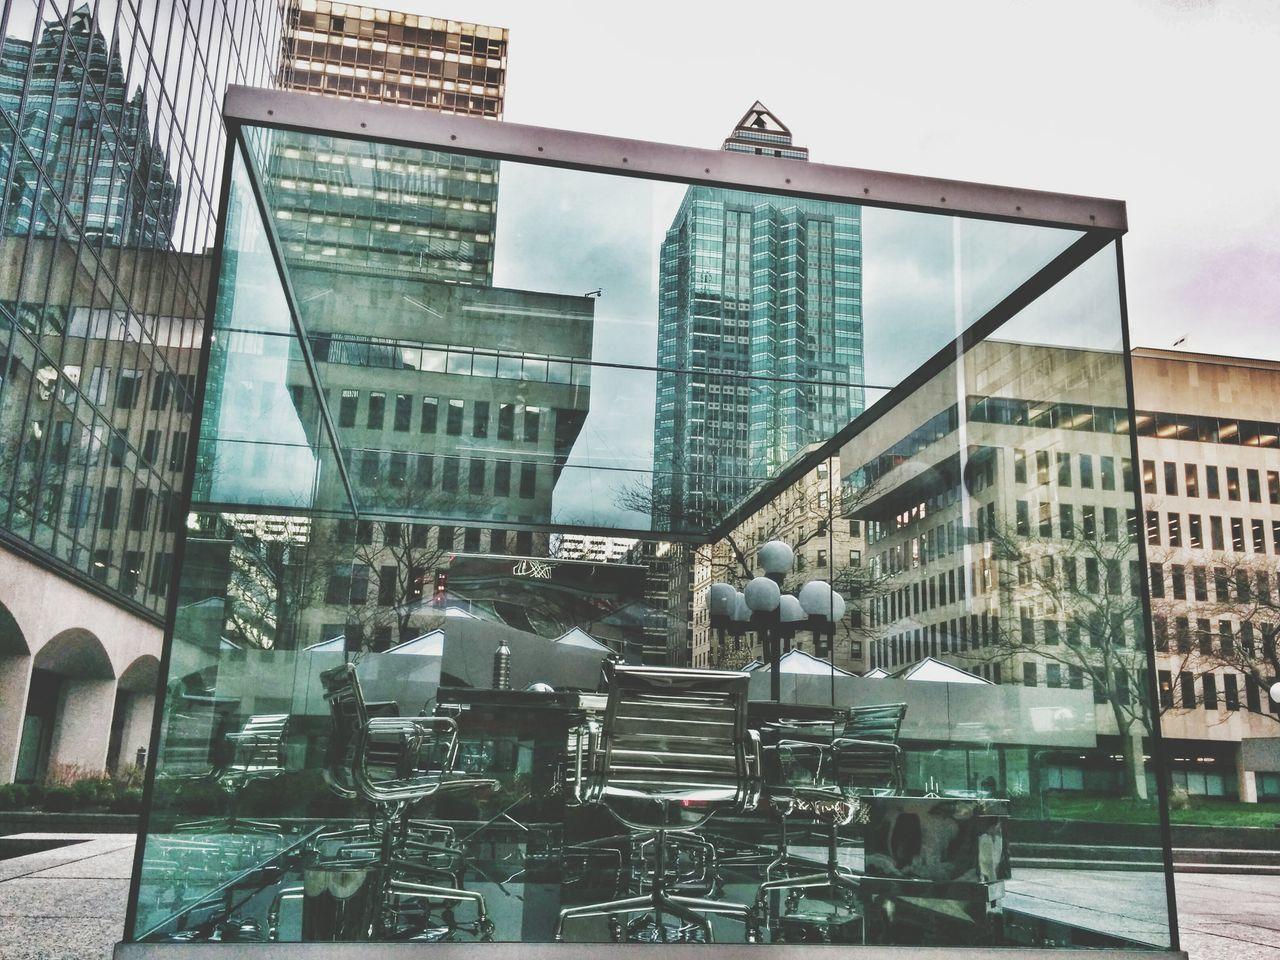 Streetphotography Urban Landscape Architecture Buildings